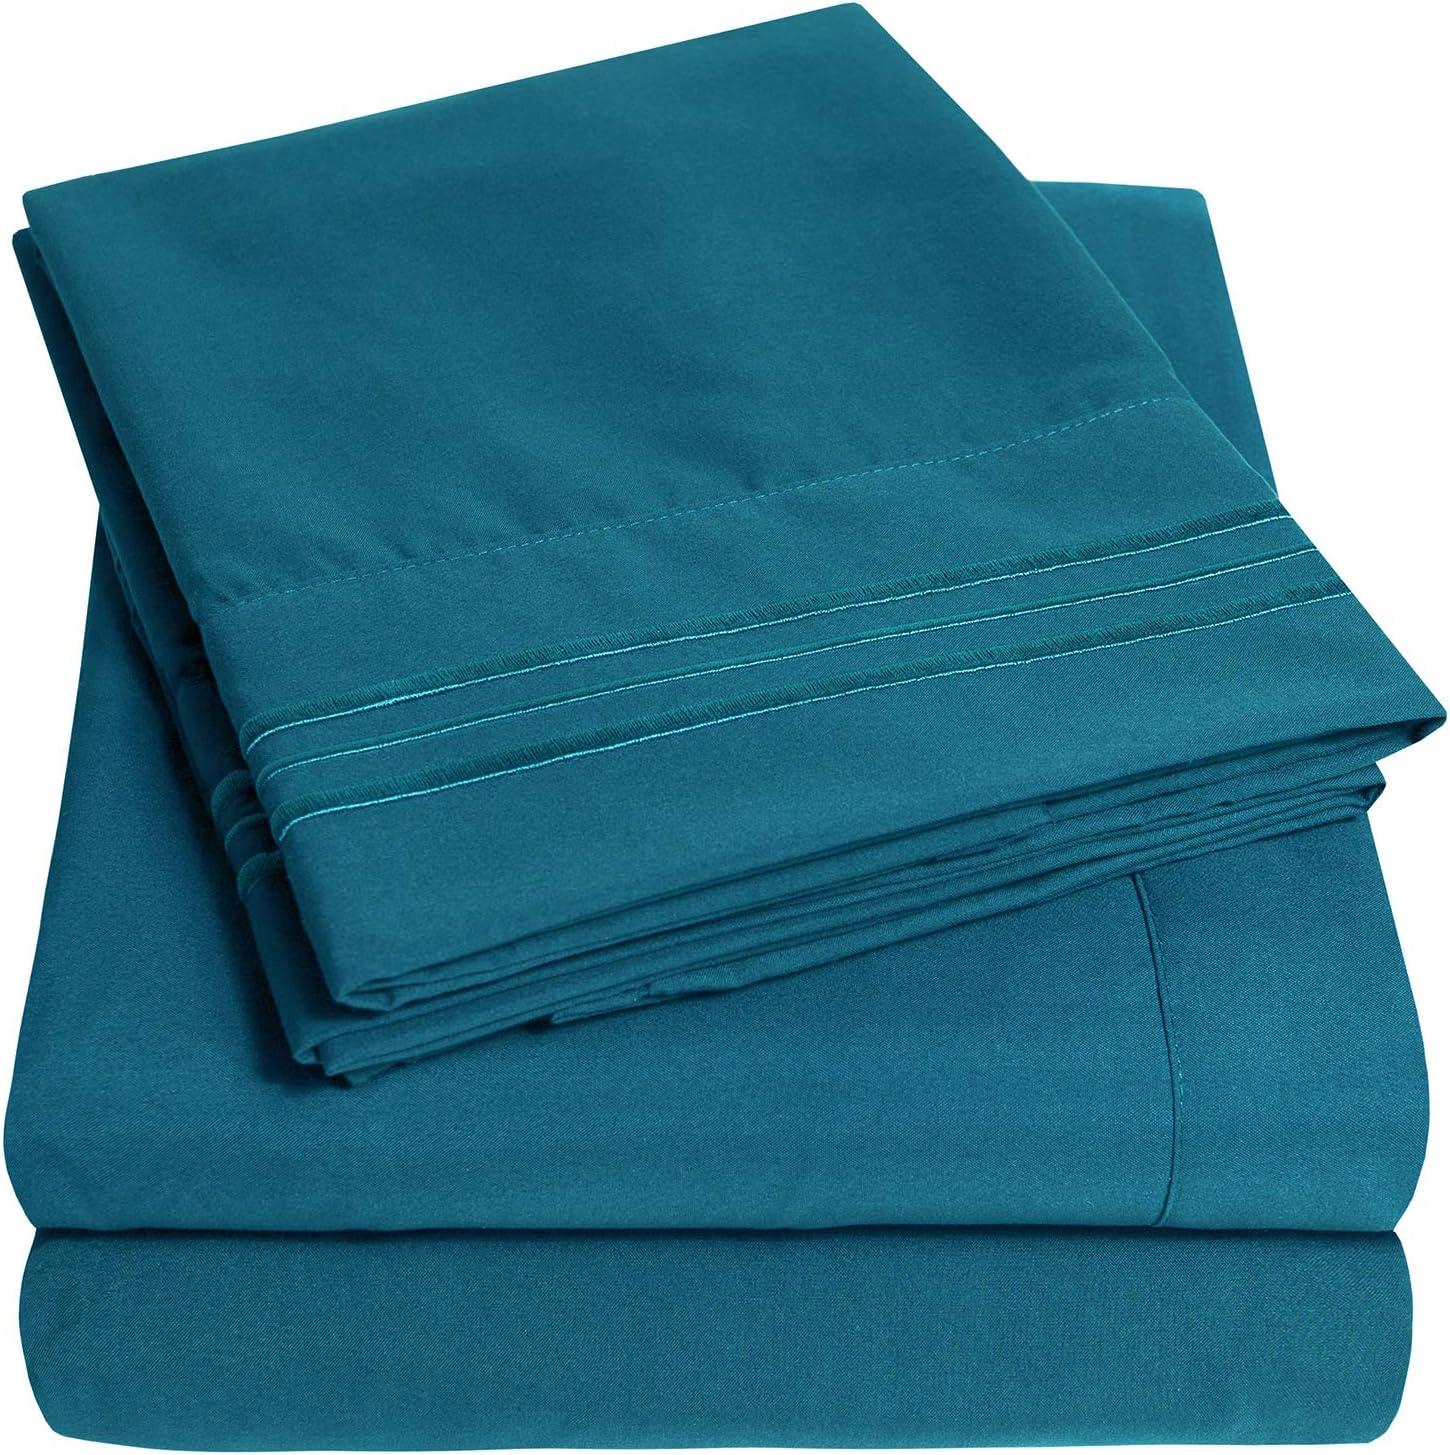 1500 Supreme Collection Bed Sheet Set